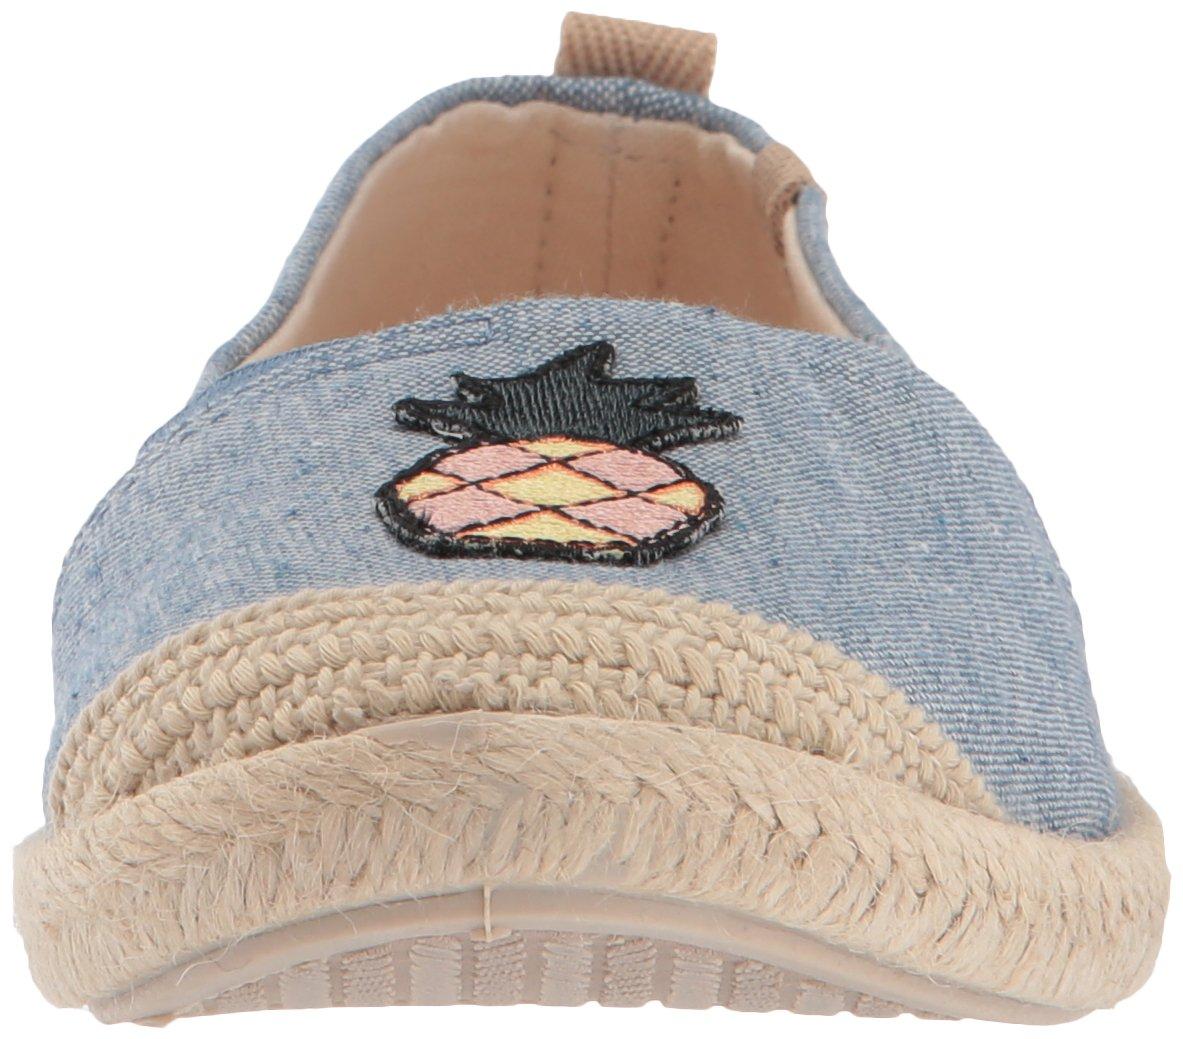 Roxy Women's Flora Slip on Shoe Sneaker B071X9VC5F 6 B(M) US|Chambray